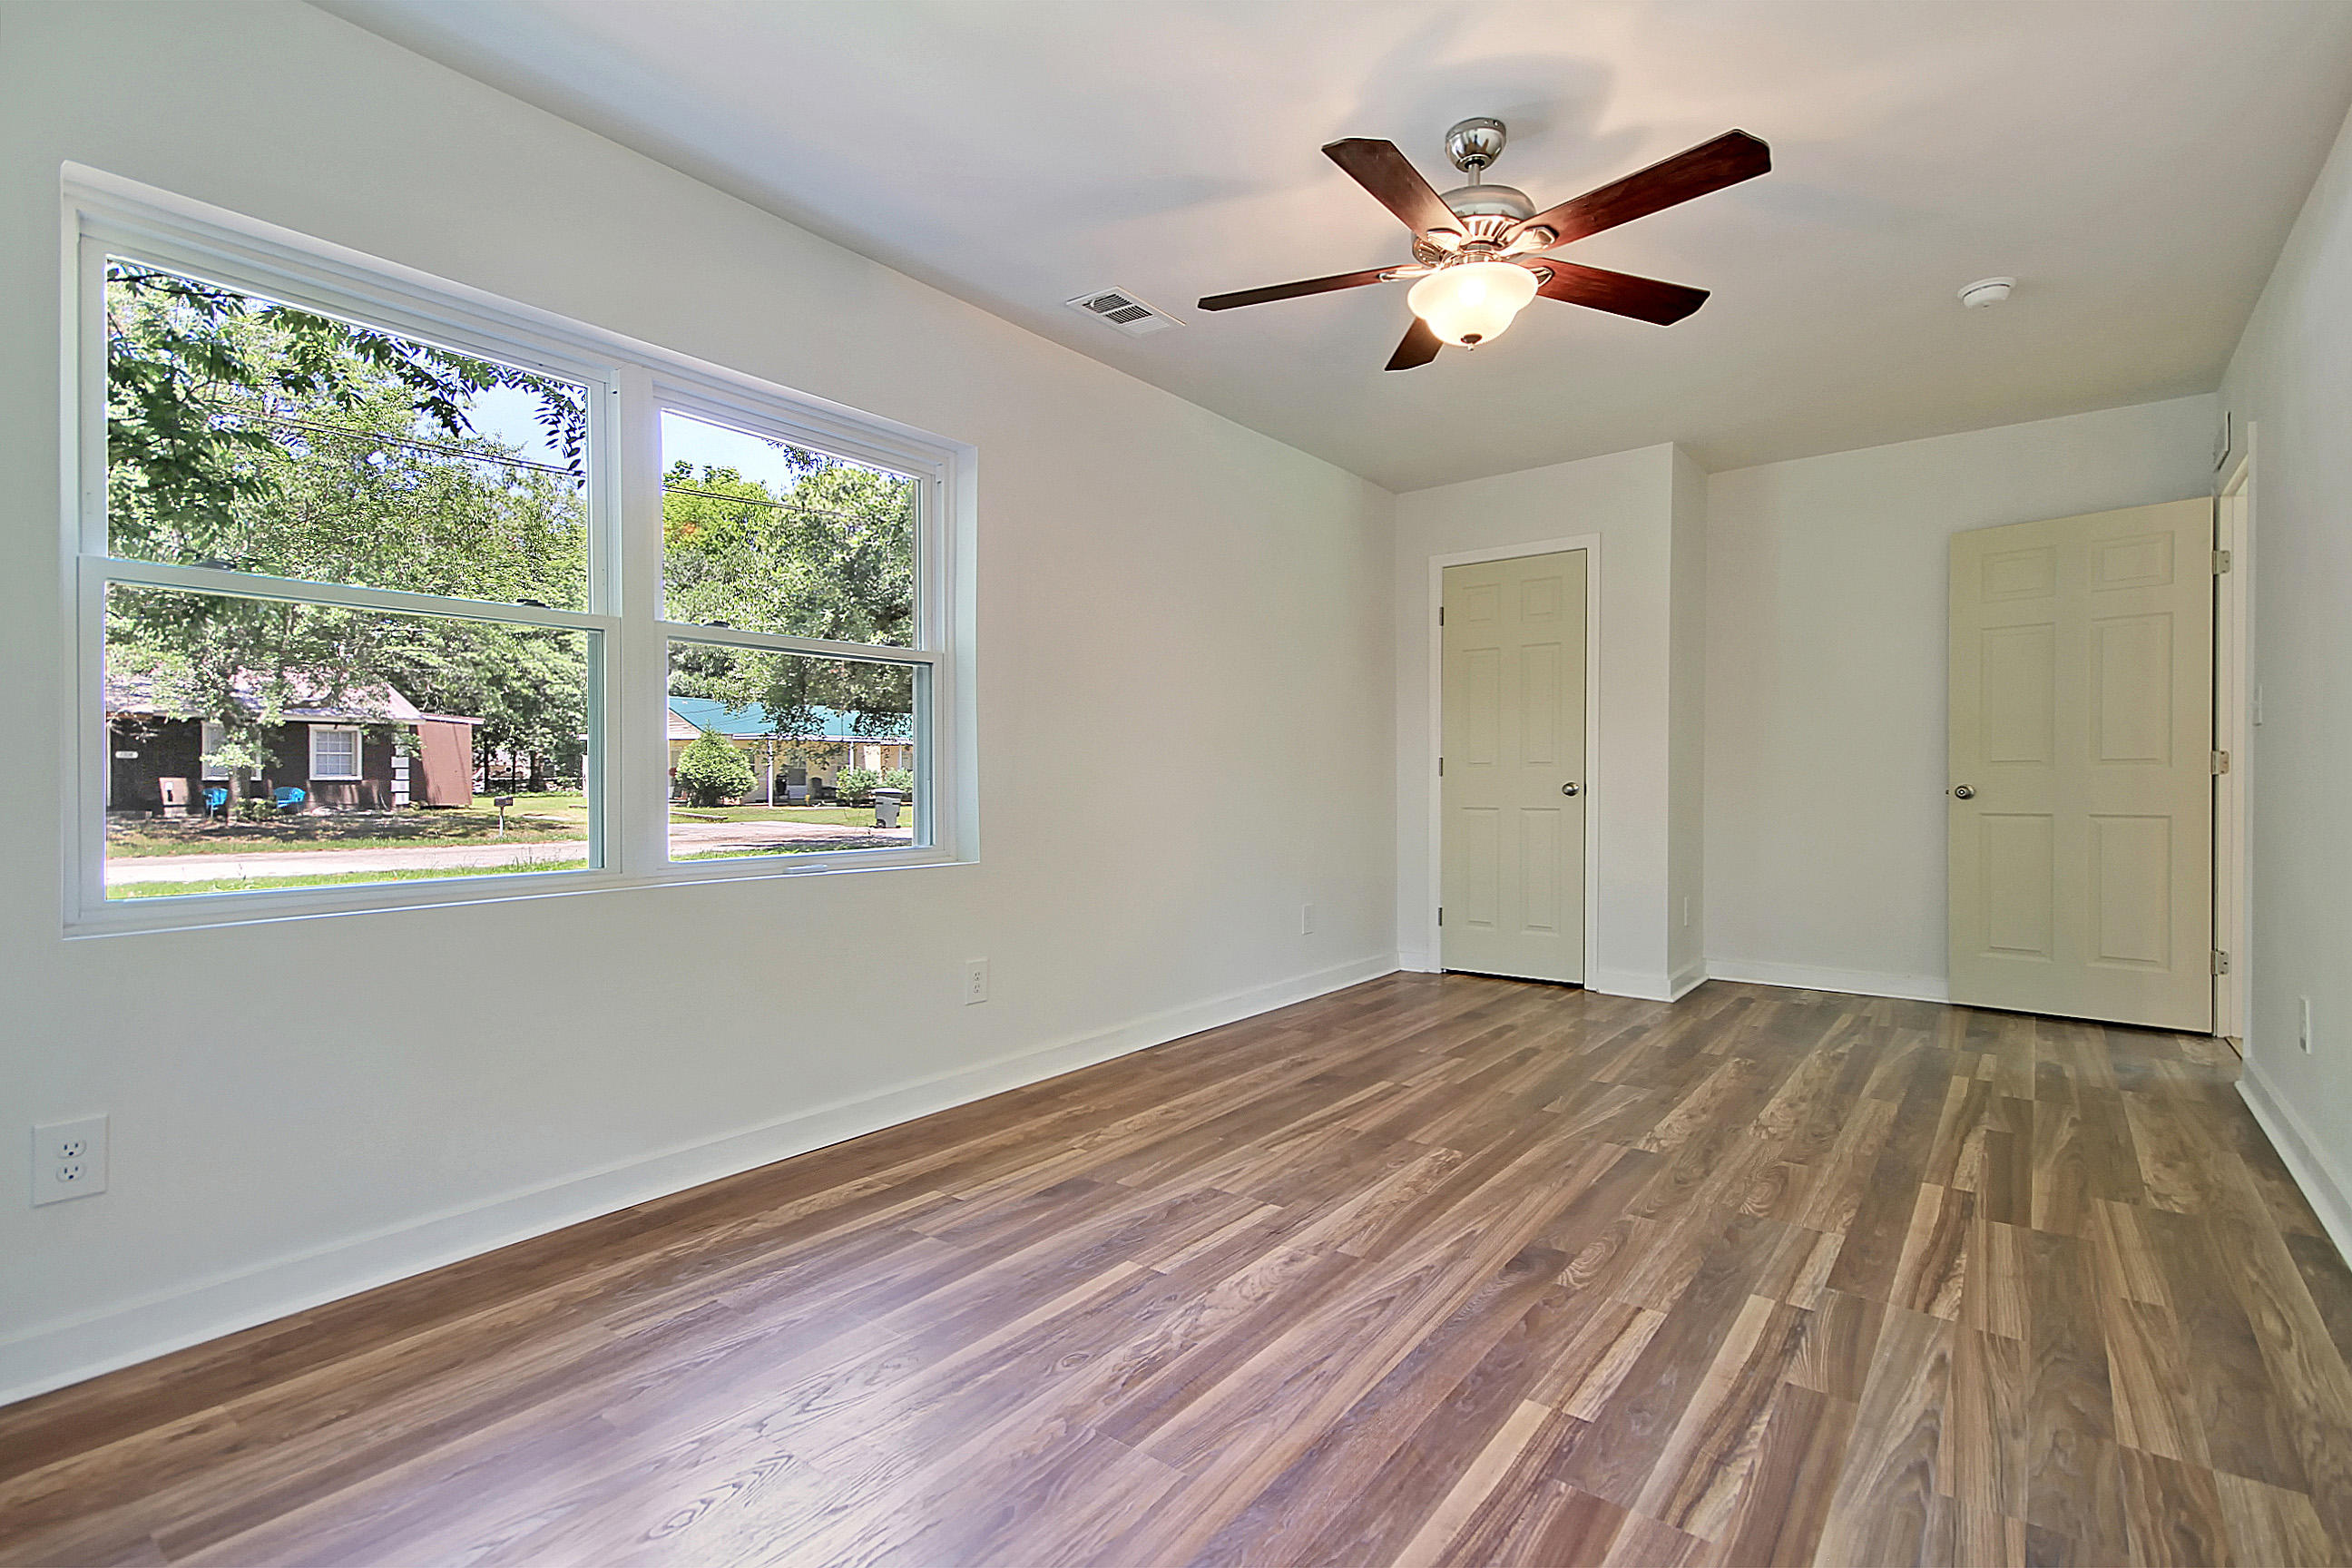 Yeamans Park Homes For Sale - 1207 Jones, Hanahan, SC - 18